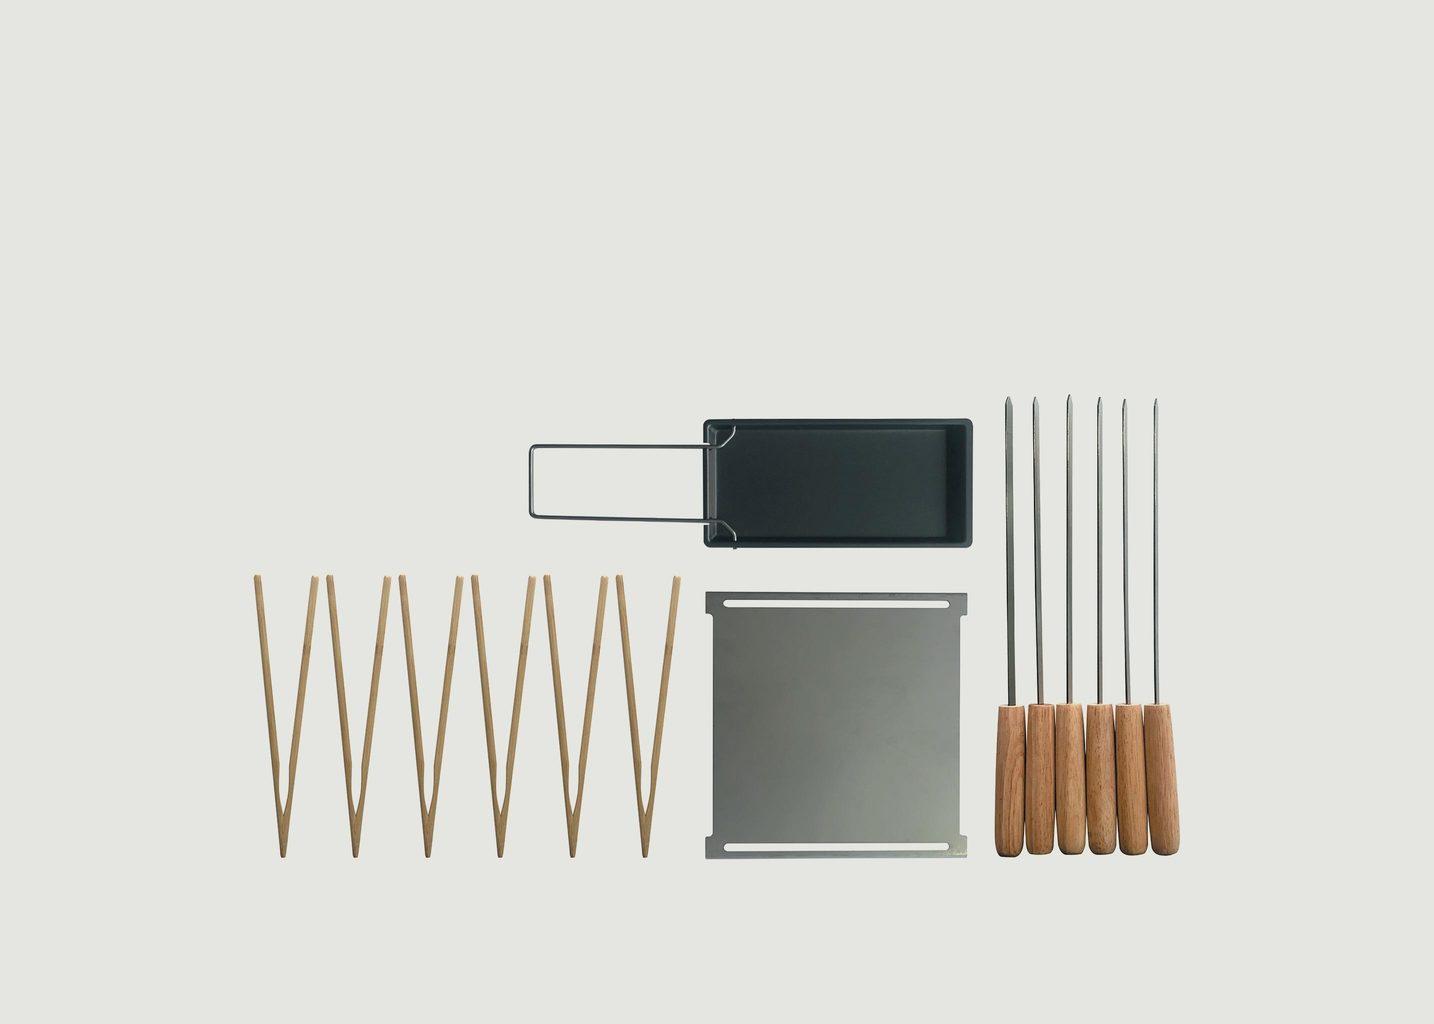 Accessoires Premium pour Barbecue Yaki - Cookut